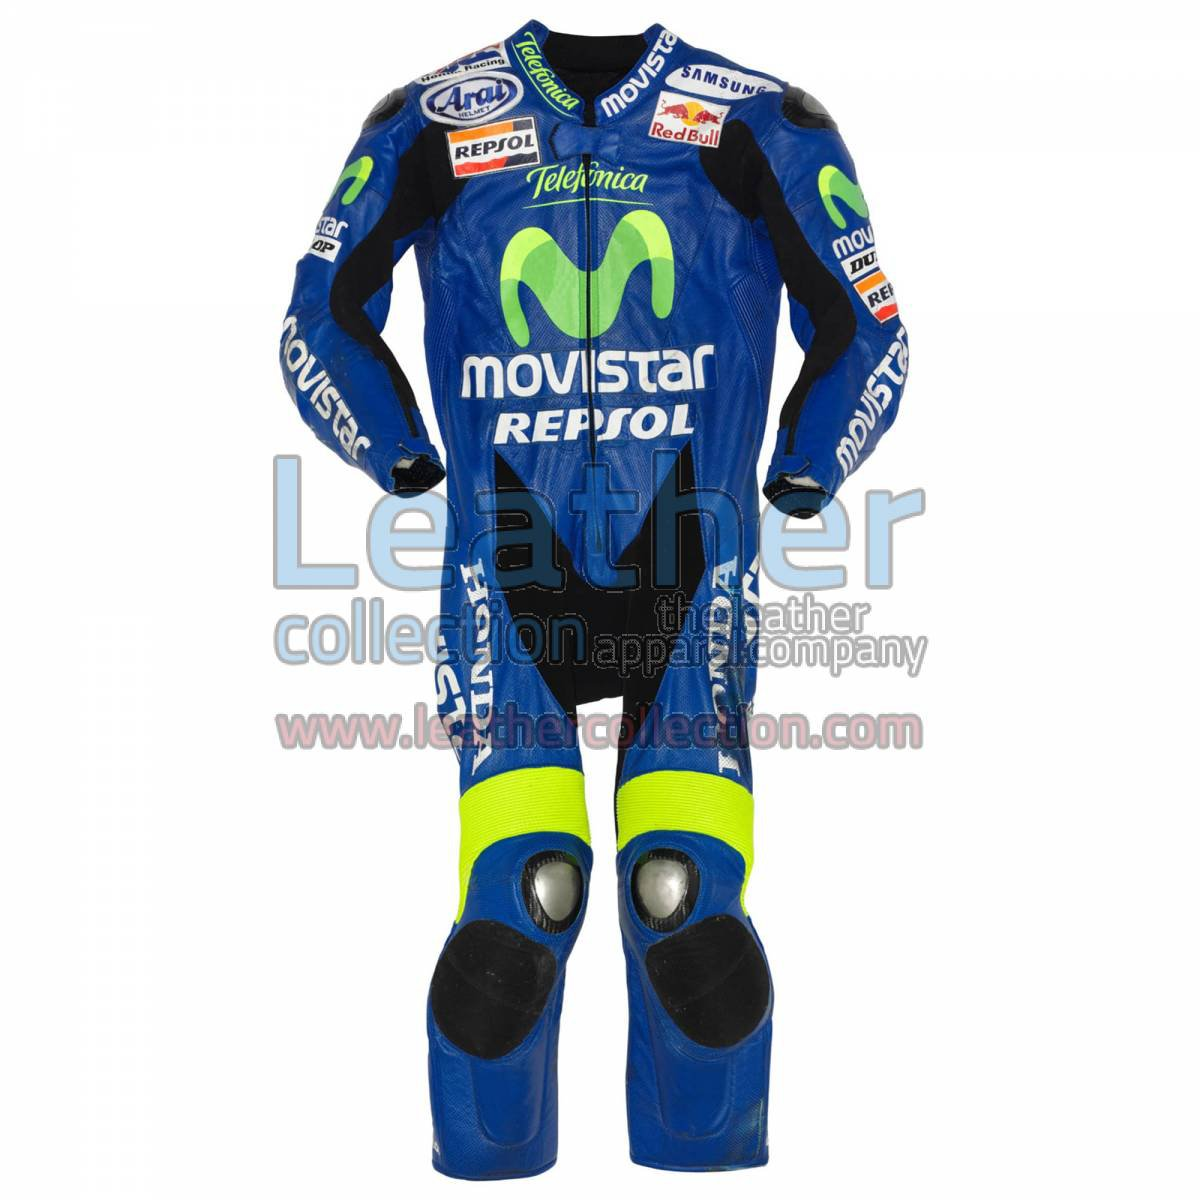 Dani Pedrosa Movistar Honda GP 2005 Leathers